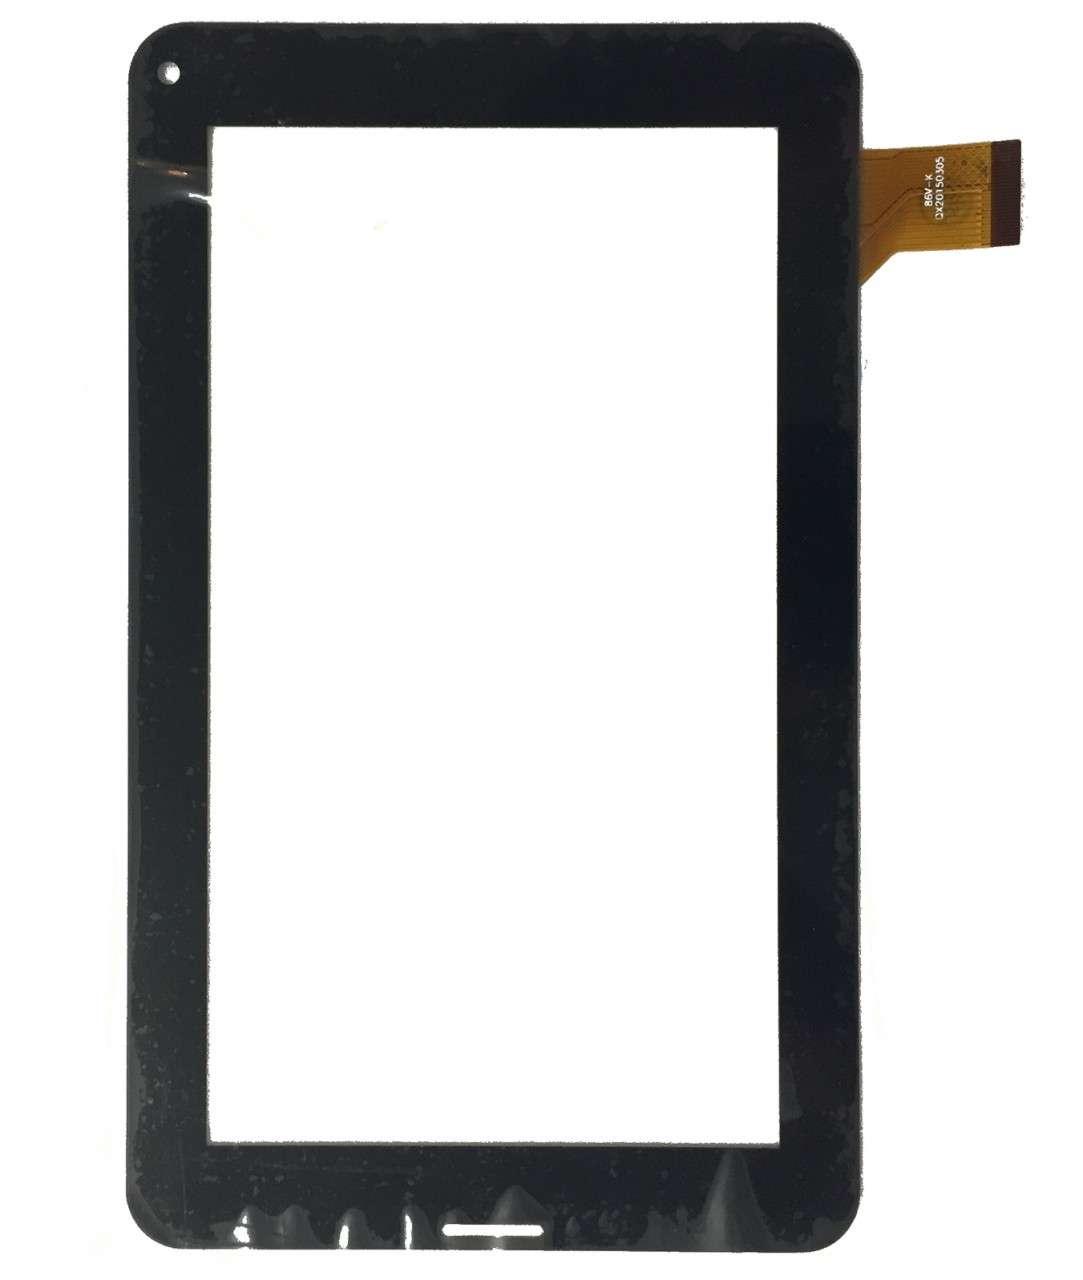 Touchscreen Digitizer Myria Connect S747G cu speaker hole Geam Sticla Tableta imagine powerlaptop.ro 2021